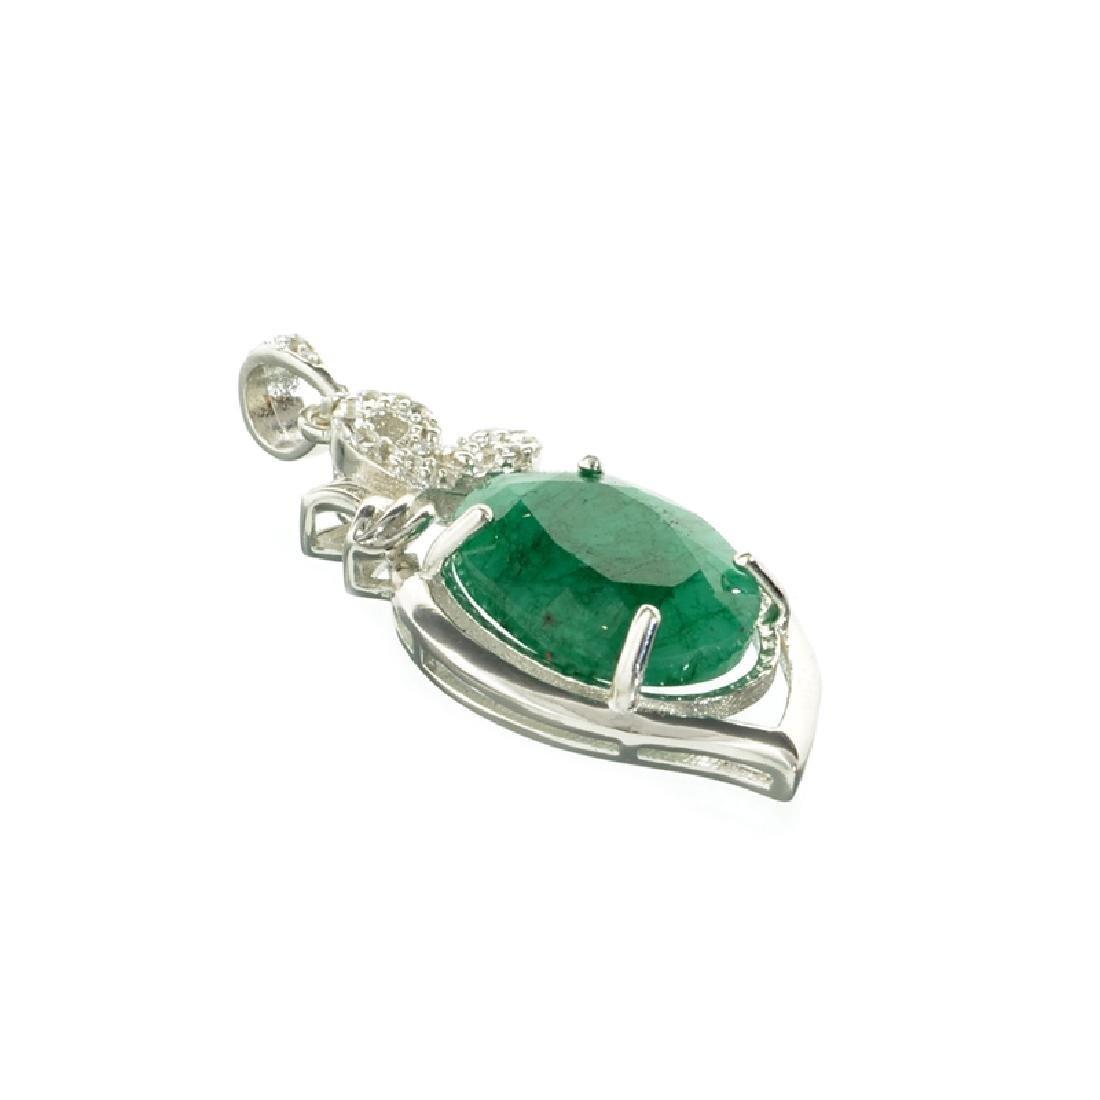 APP: 0.6k Fine Jewelry 8.00CT Oval Cut Green Beryl And